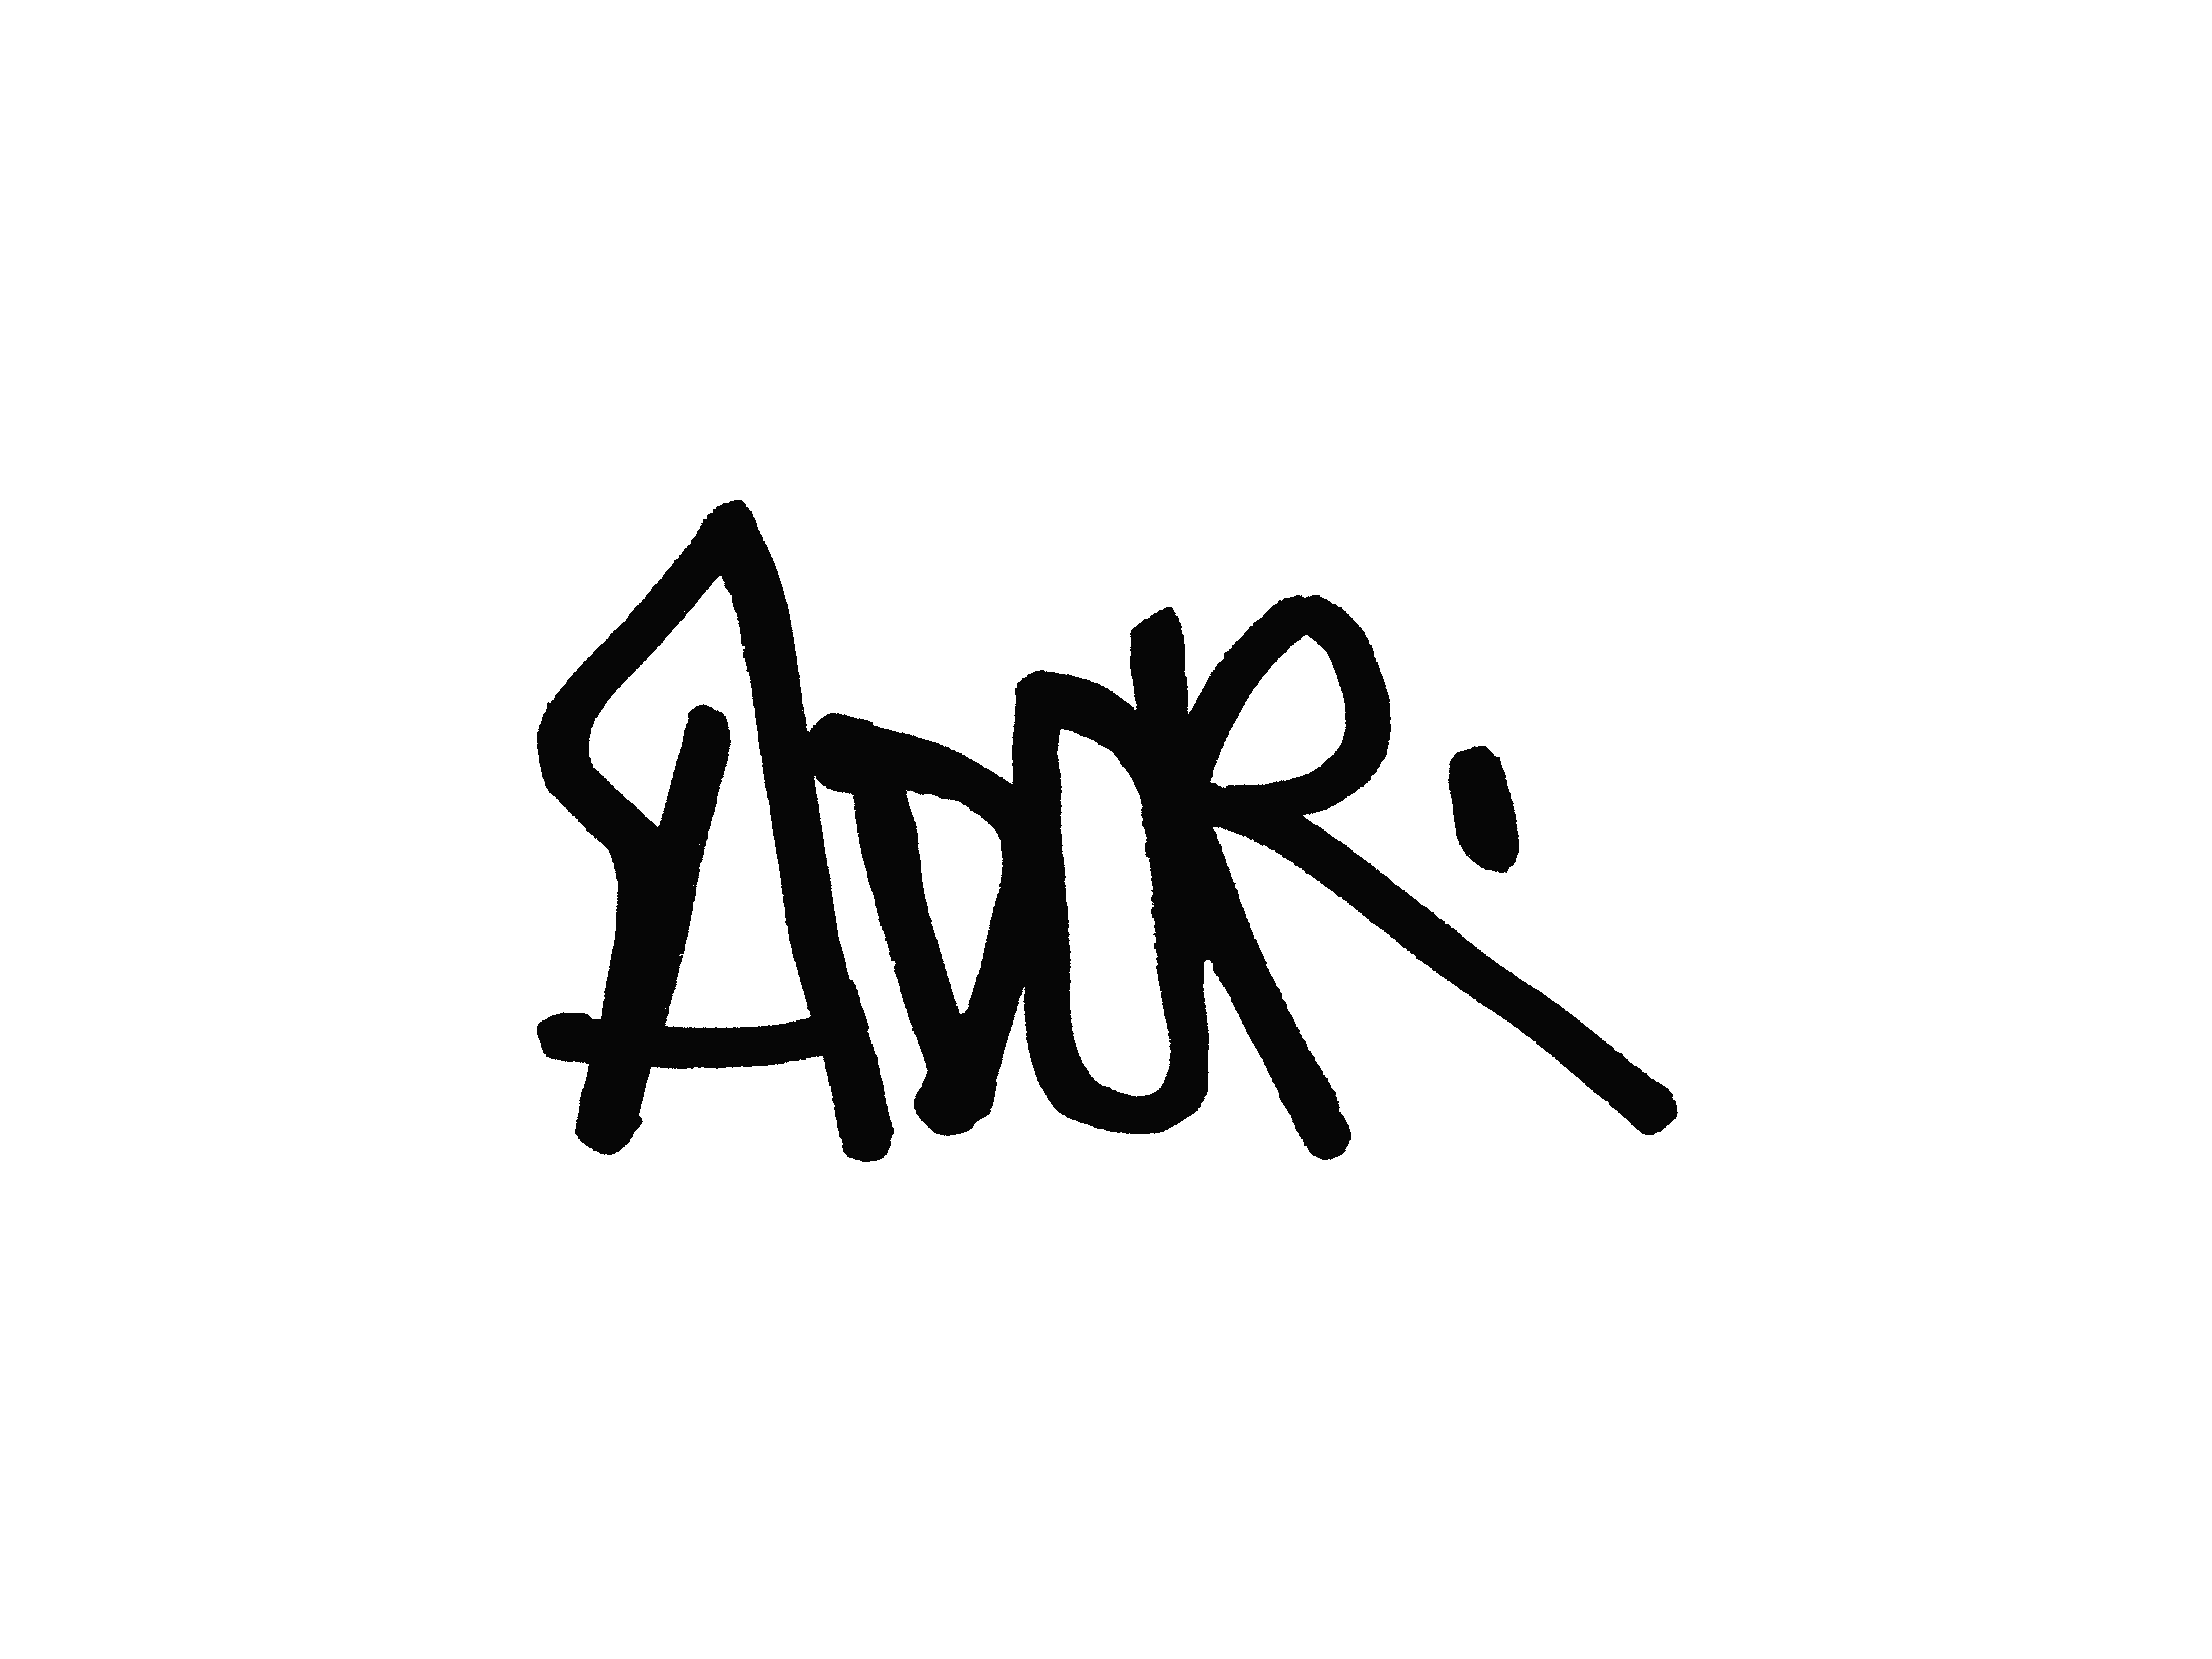 Signature de l'artiste ADOR